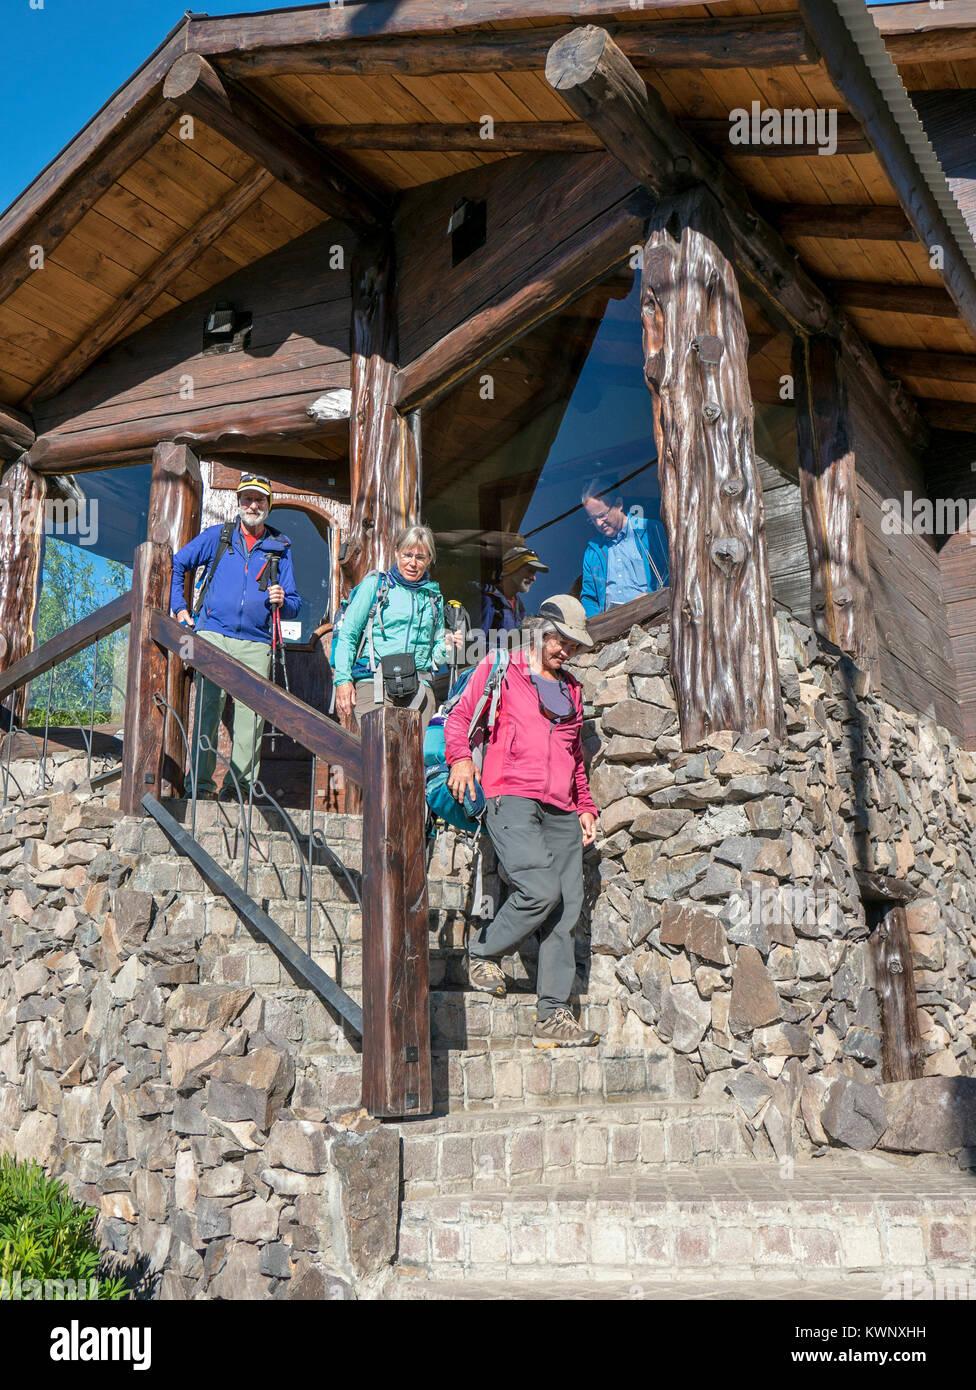 Travelers exit Infinito Sur hotel & lodge; El Chaltén; Chile - Stock Image